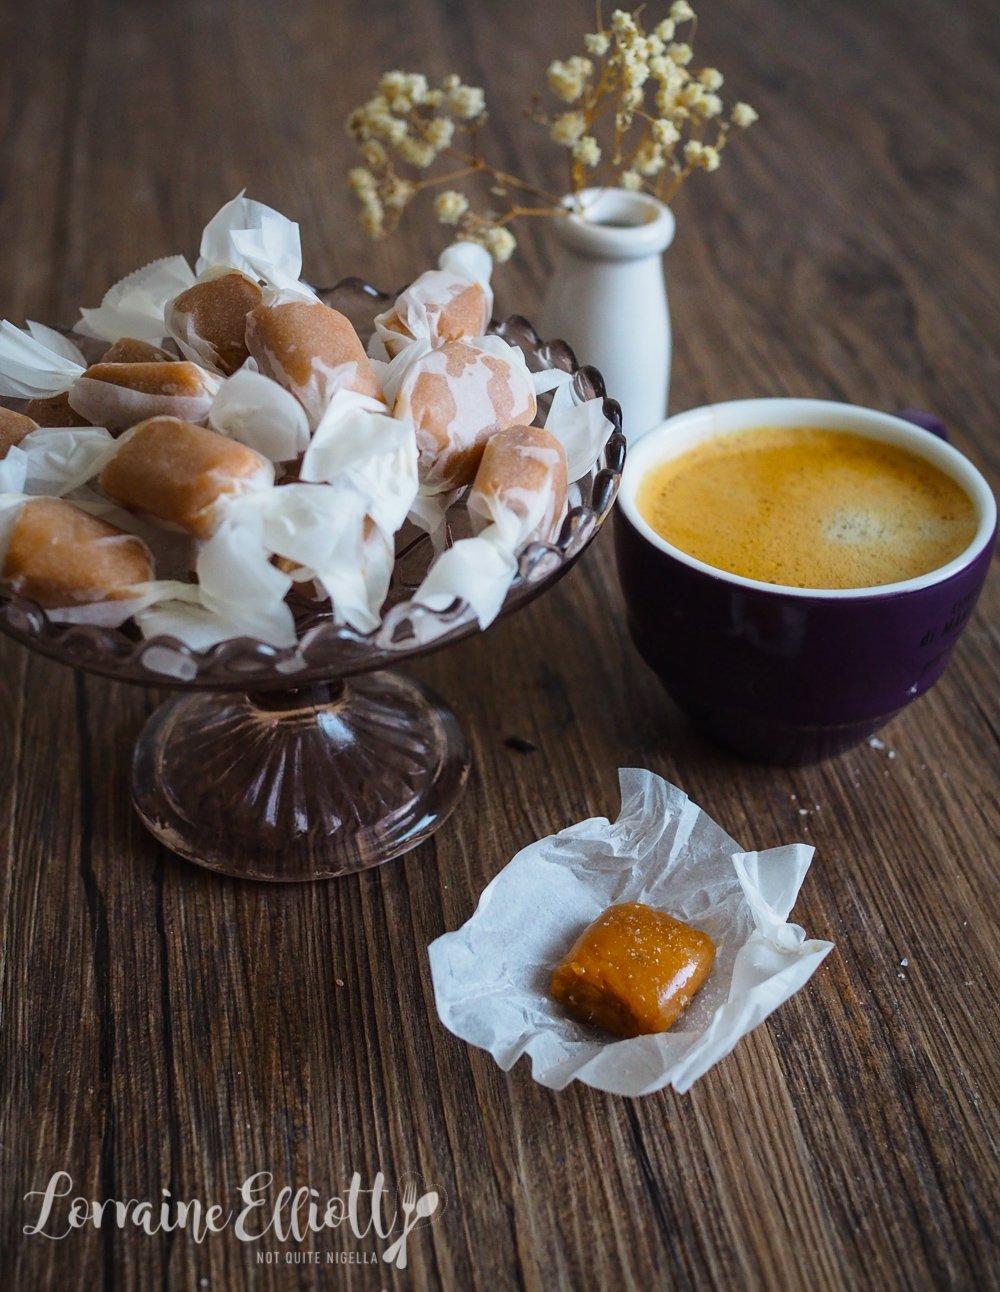 Peanut Butter Salted Caramels